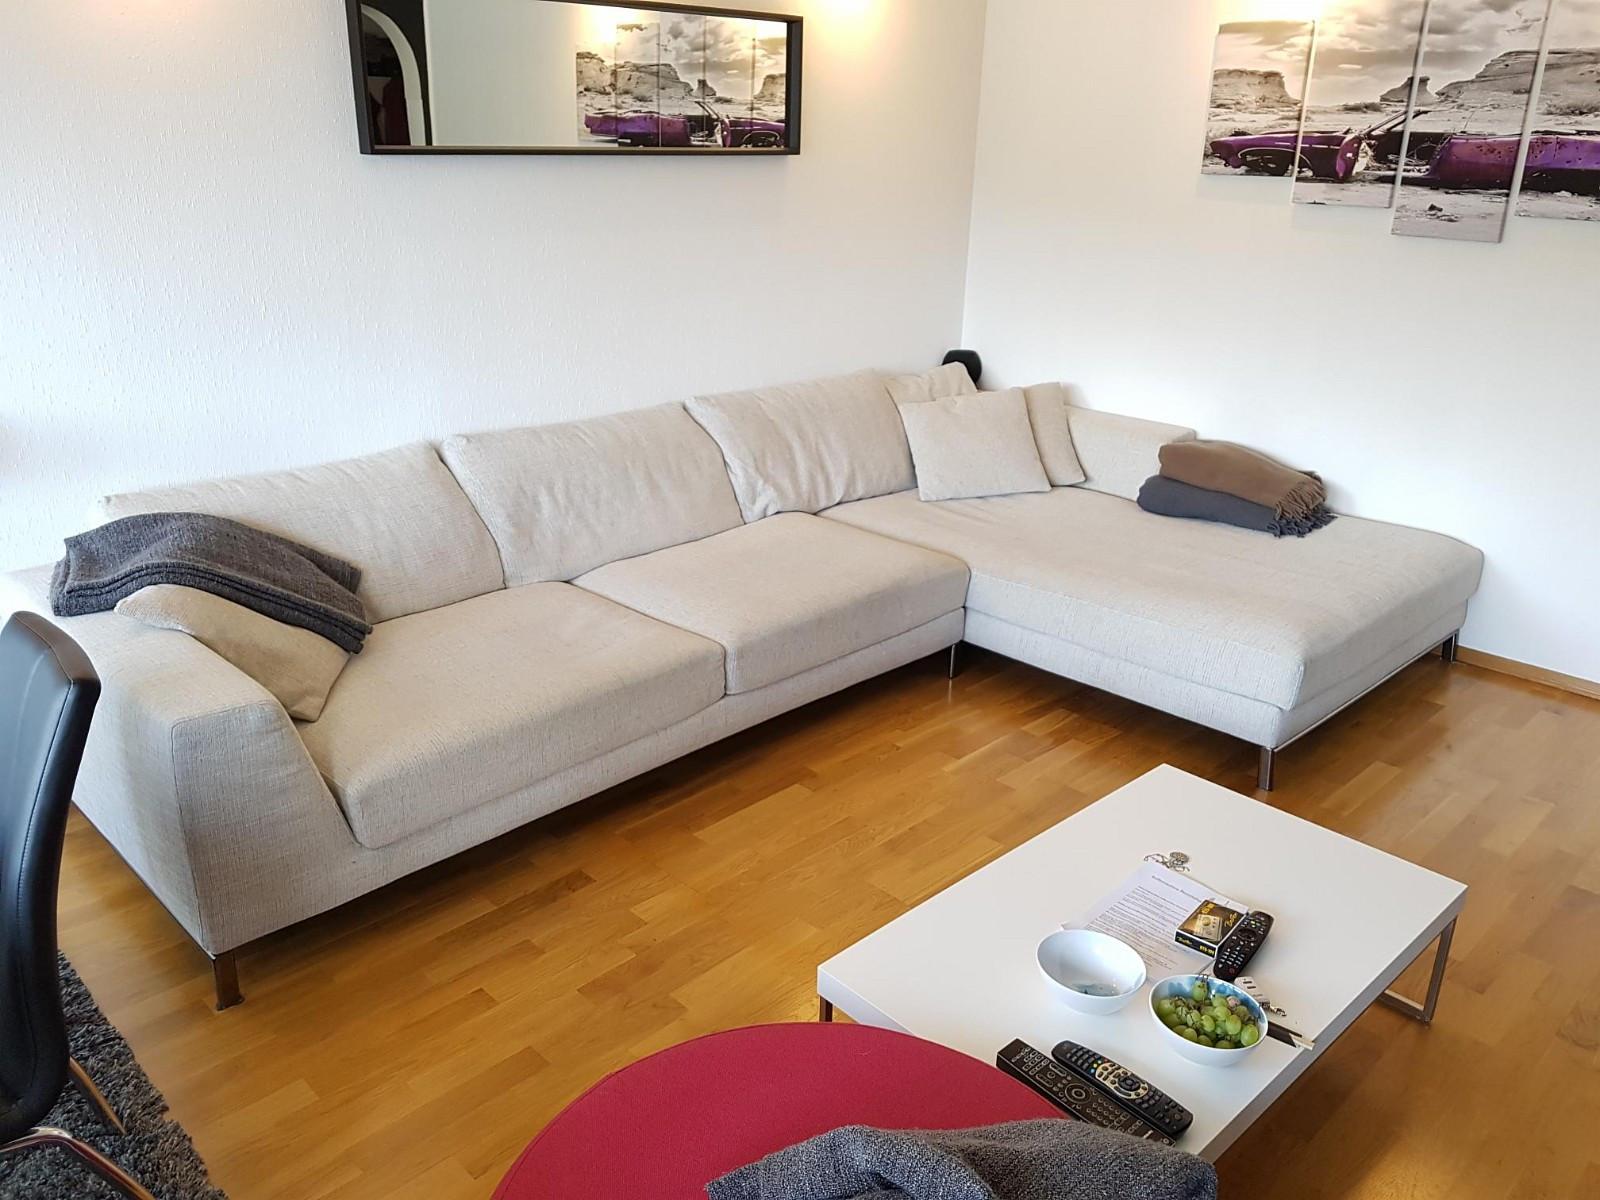 Sofa - Bergen  - Sofa med sjeselong selges. Mål: 350cm x 200cm. Sofa er i to deler med separate puter. Kan hentes fortløpende. - Bergen